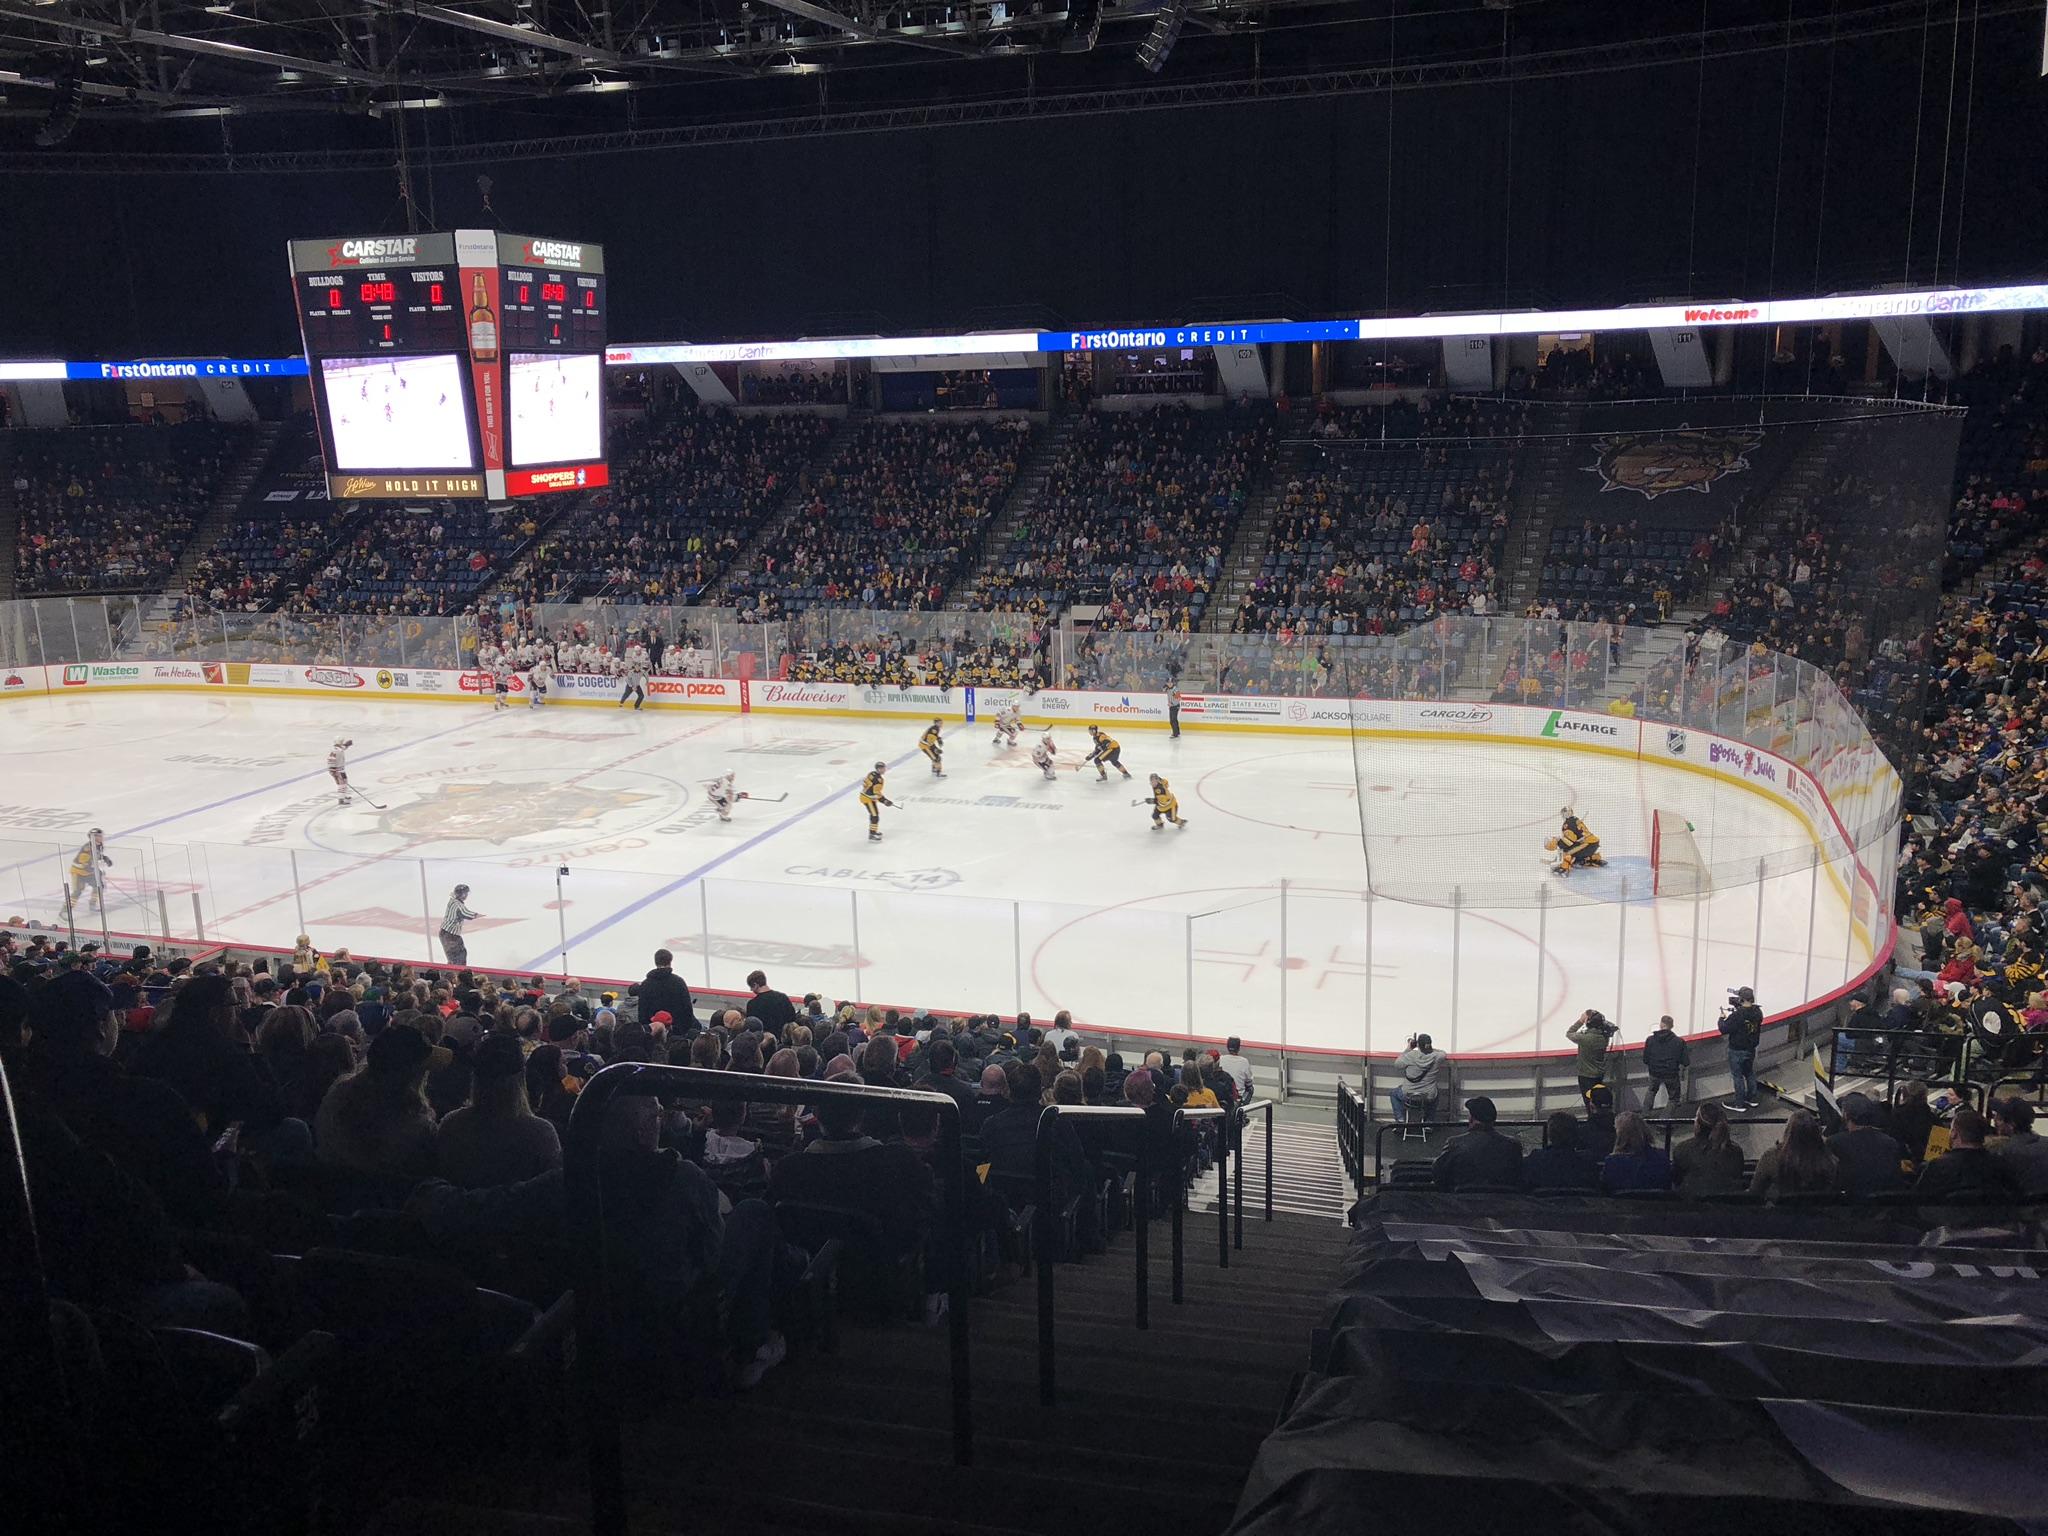 The Bulldogs against the Niagara Ice Dogs.